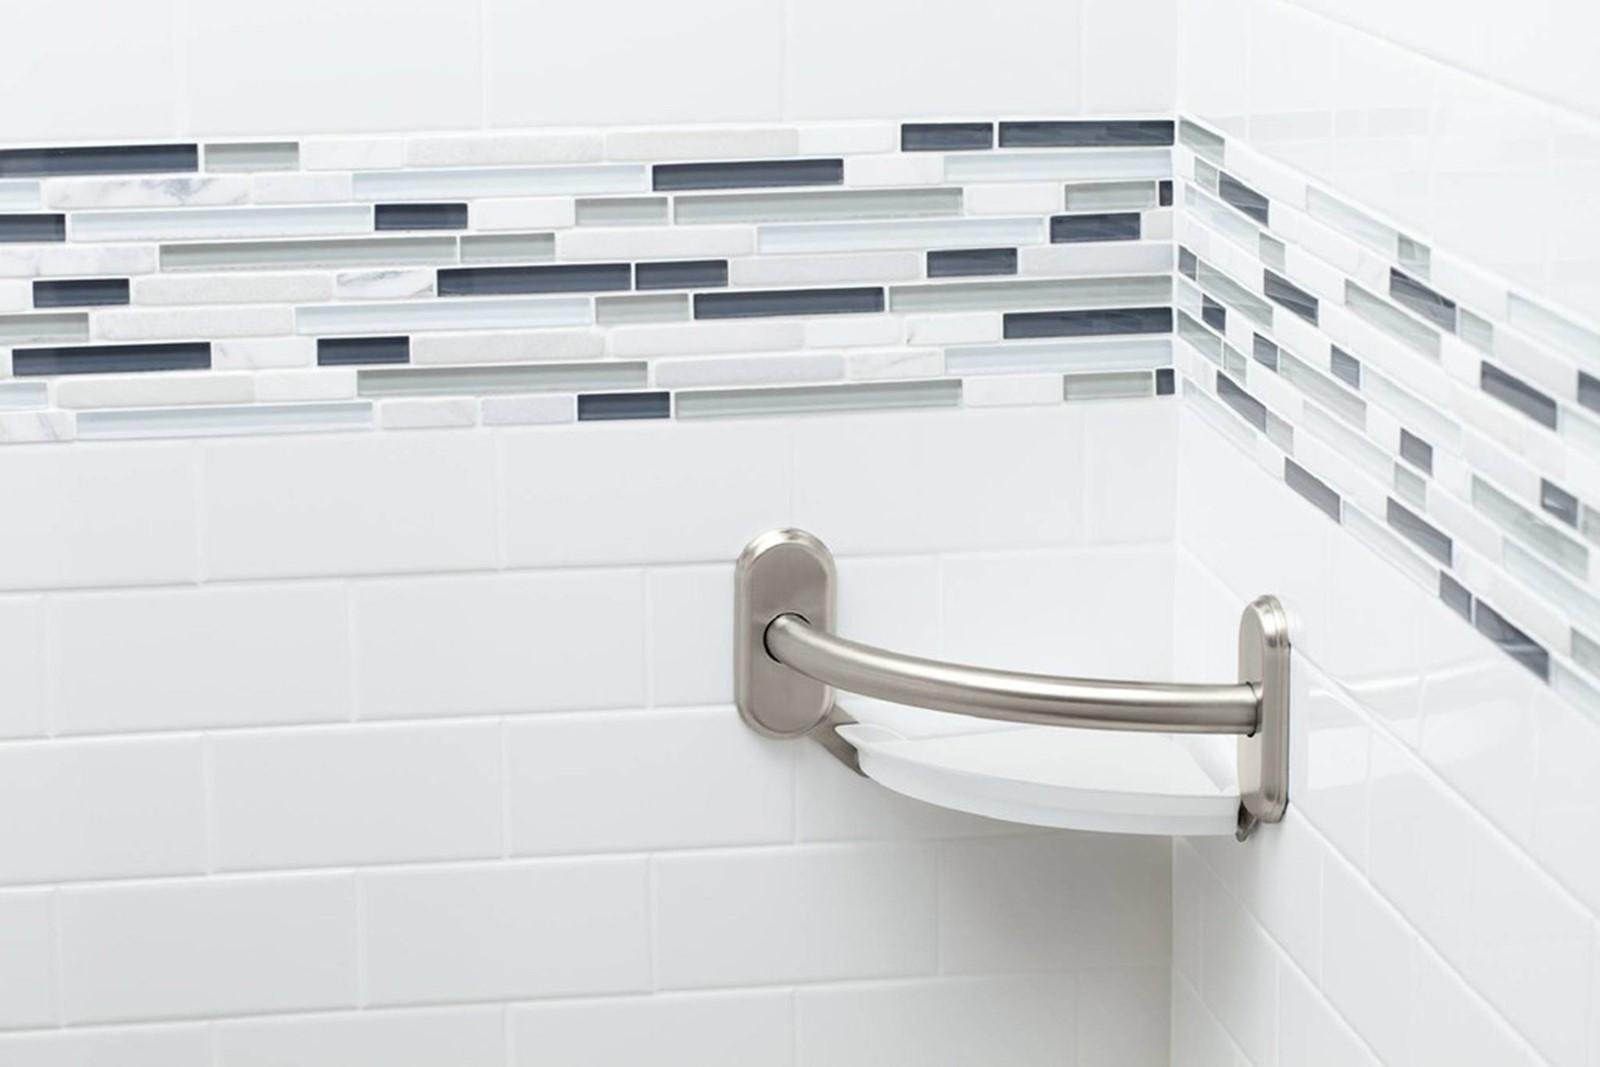 Fixing Bathroom Tile Not Always A Simple Process North - How to fix broken bathroom tile